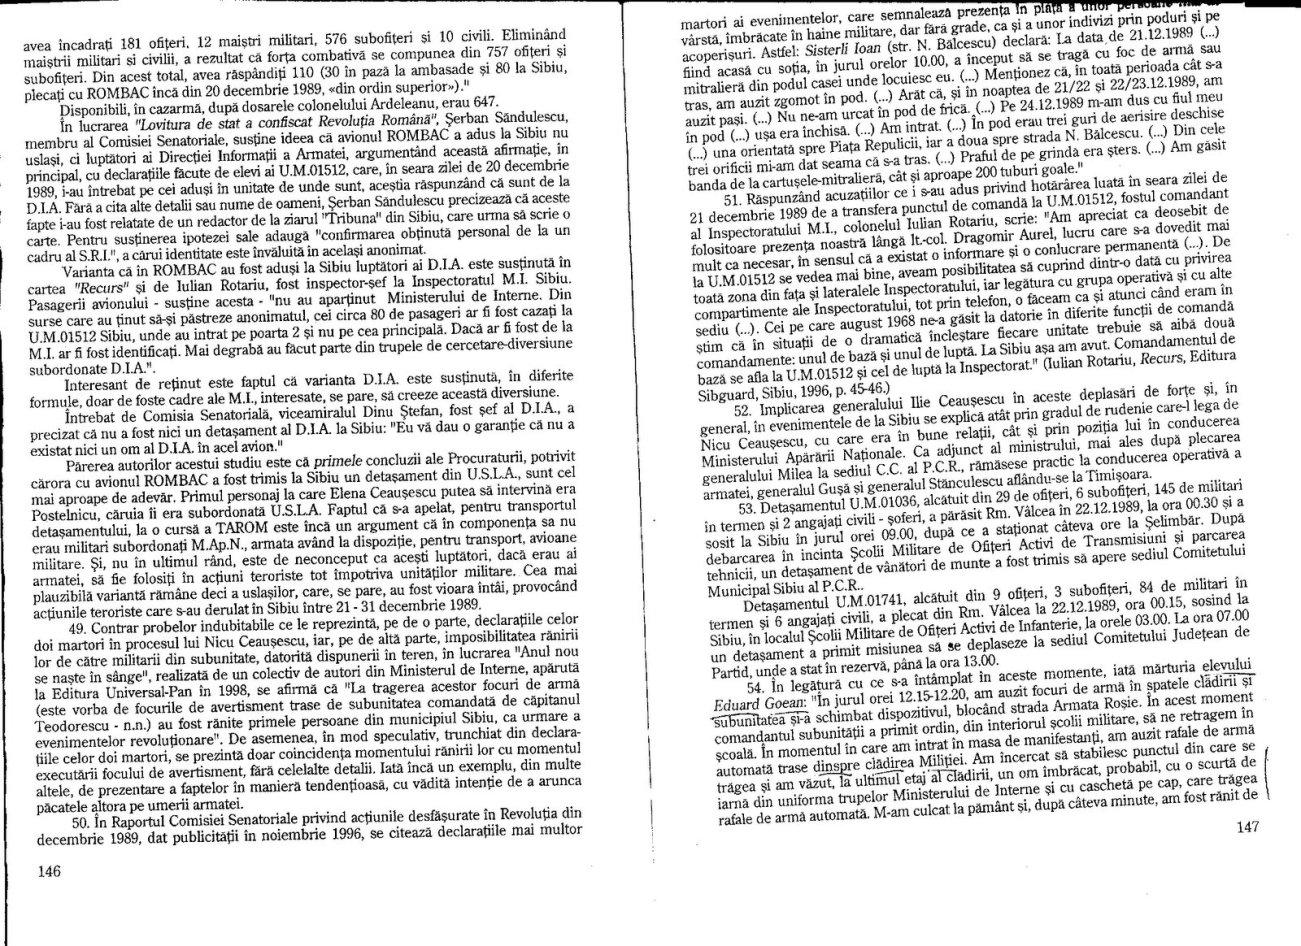 https://romanianrevolutionofdecember1989.files.wordpress.com/2010/04/top-37.jpg